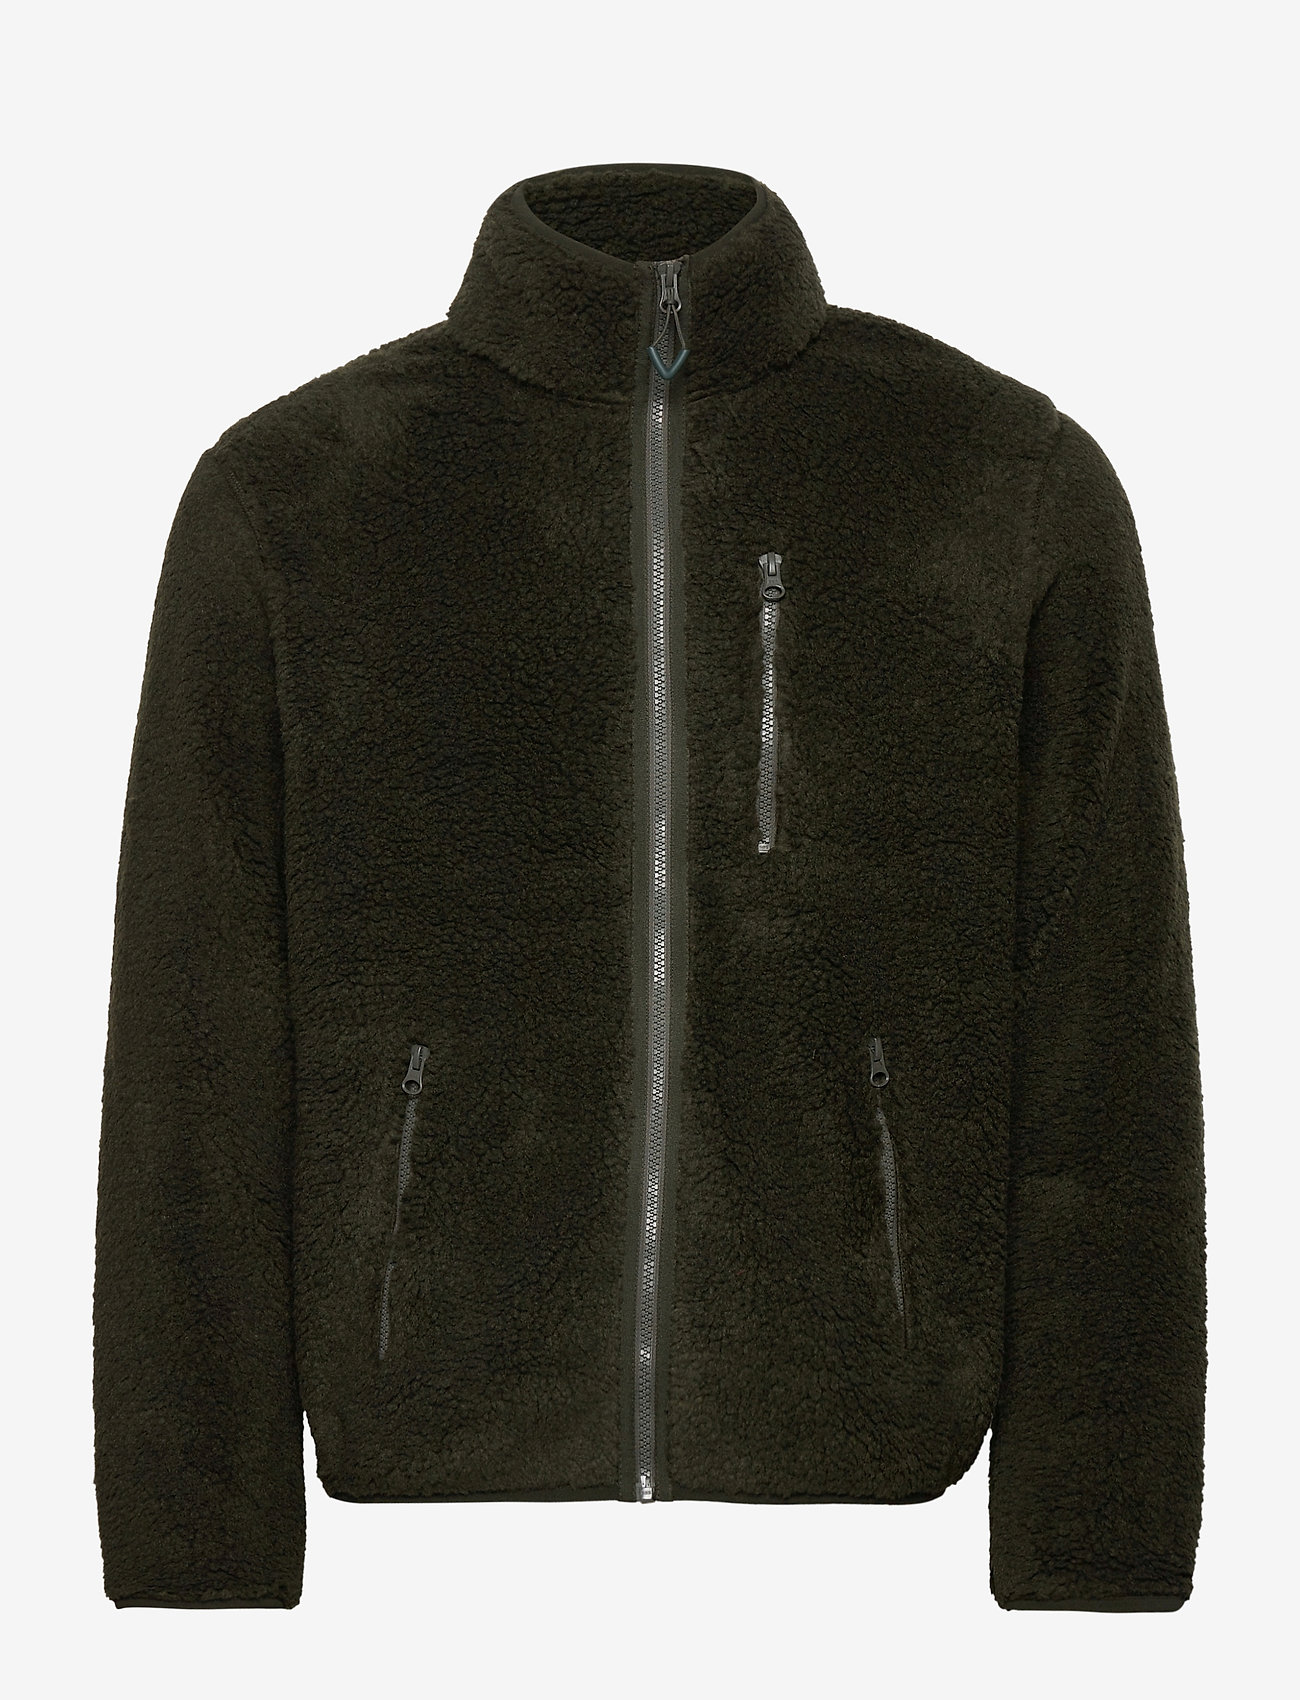 Knowledge Cotton Apparel - ELM zip teddy fleece sweat - Vegan - basic-sweatshirts - forrest night - 0